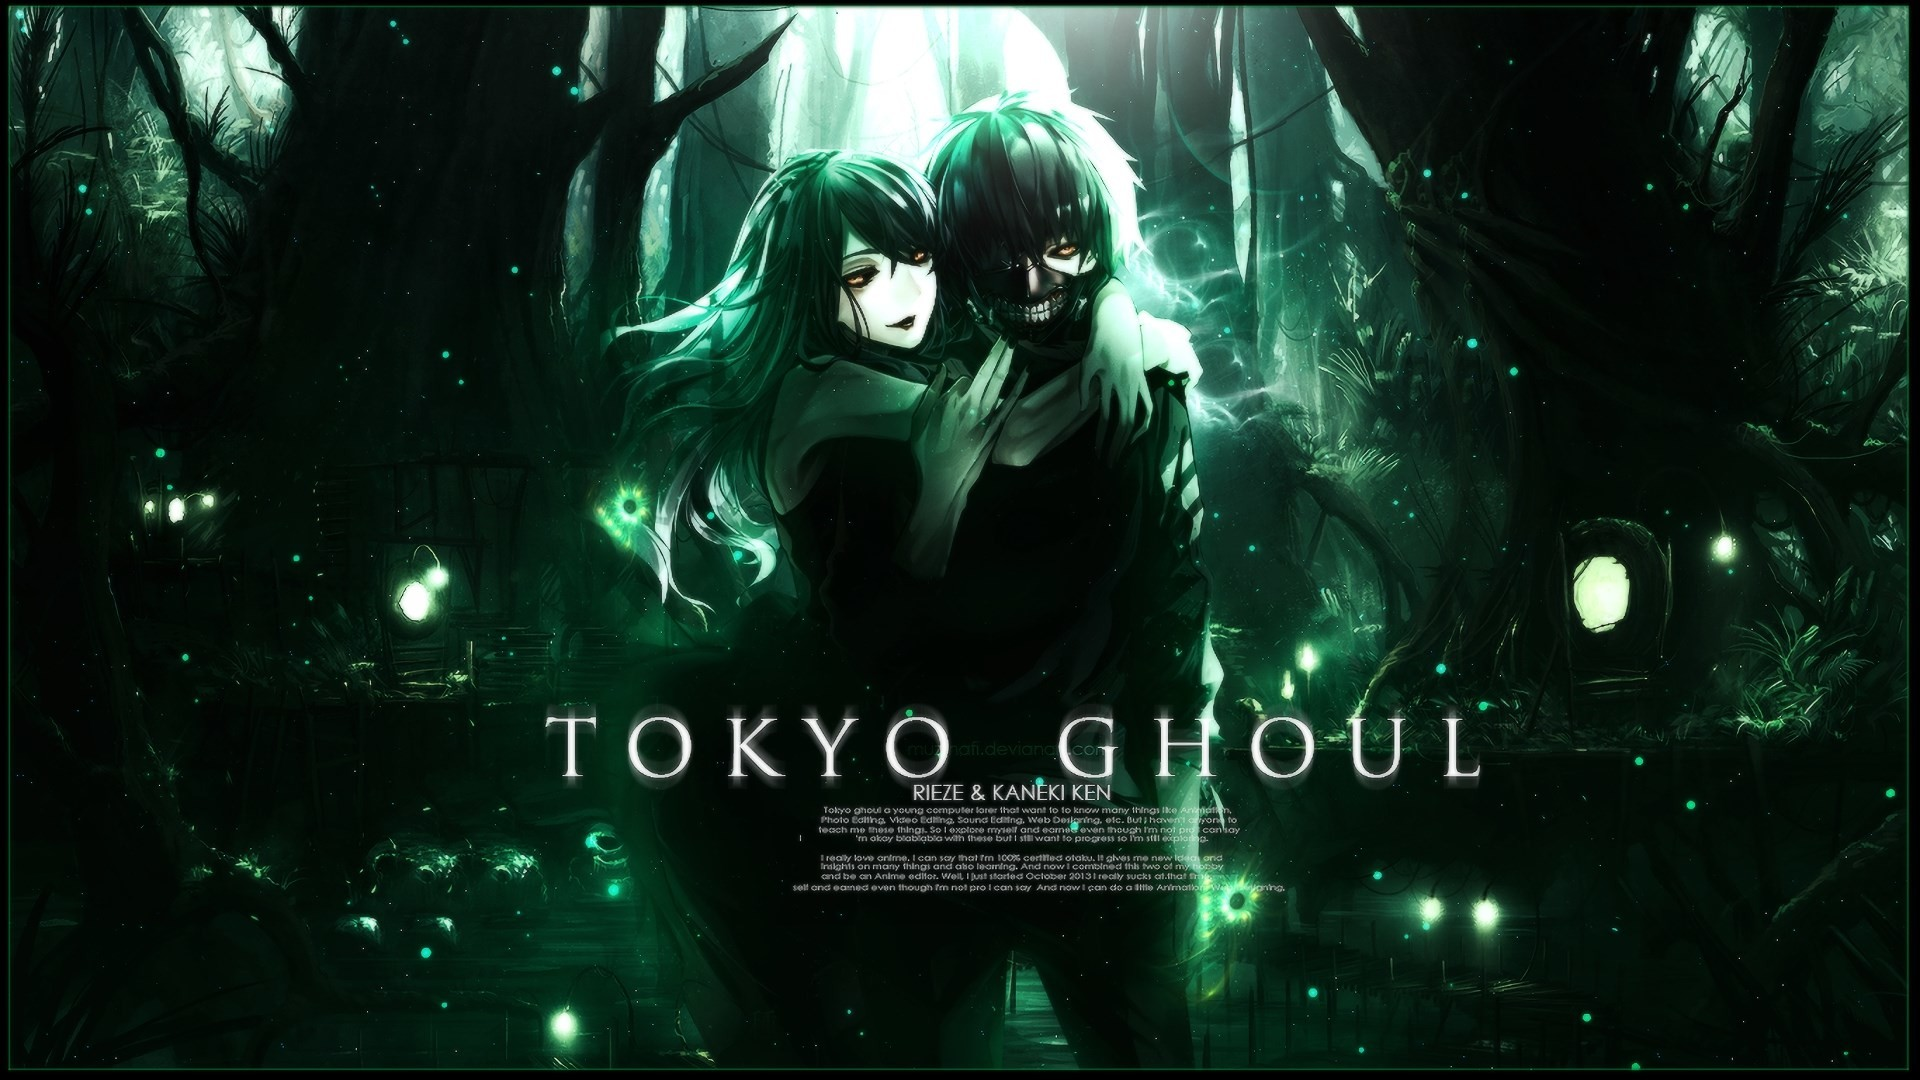 tokyo ghoul manga wikipédia